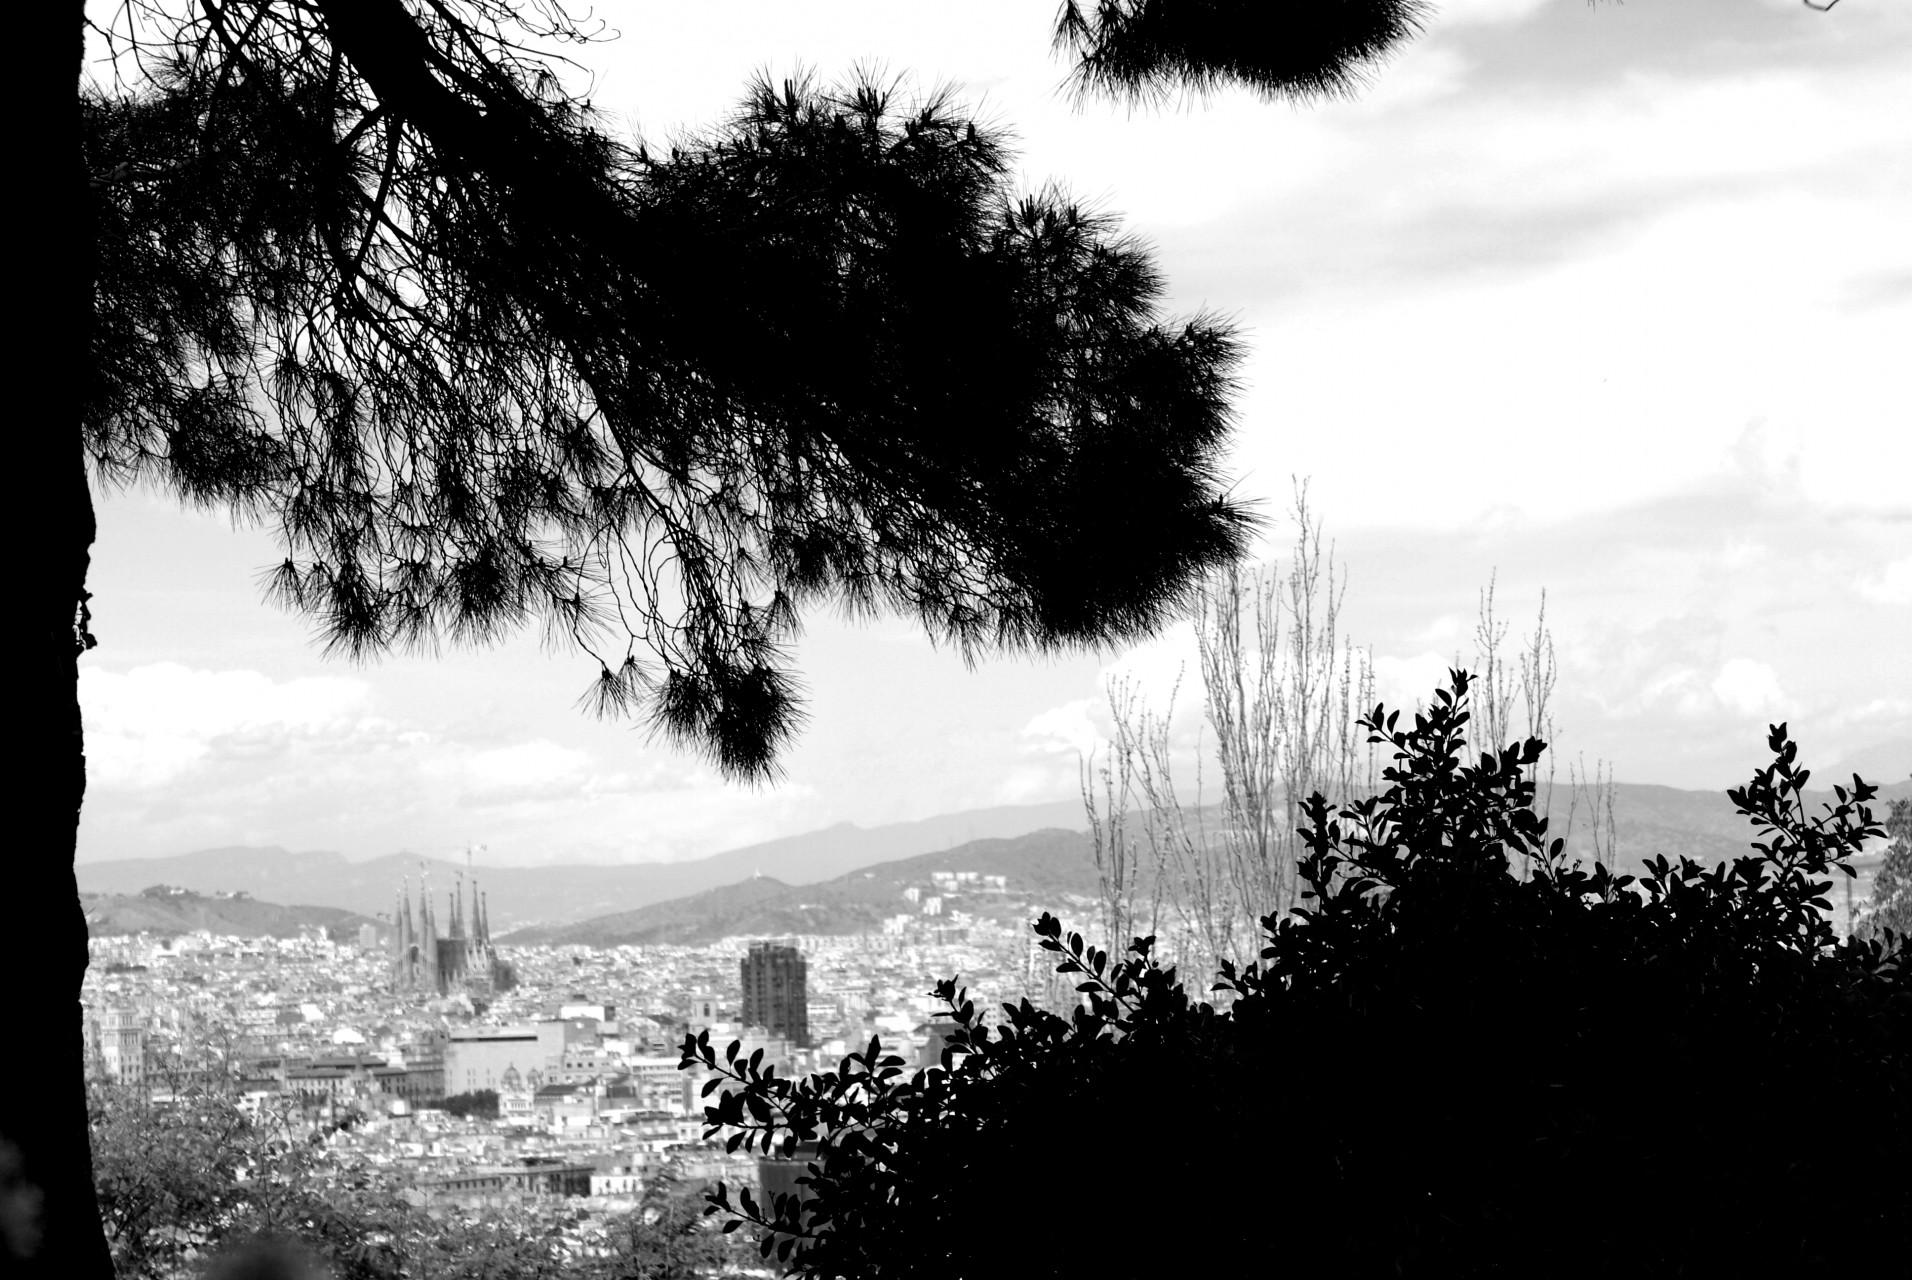 Barcelona - 2009